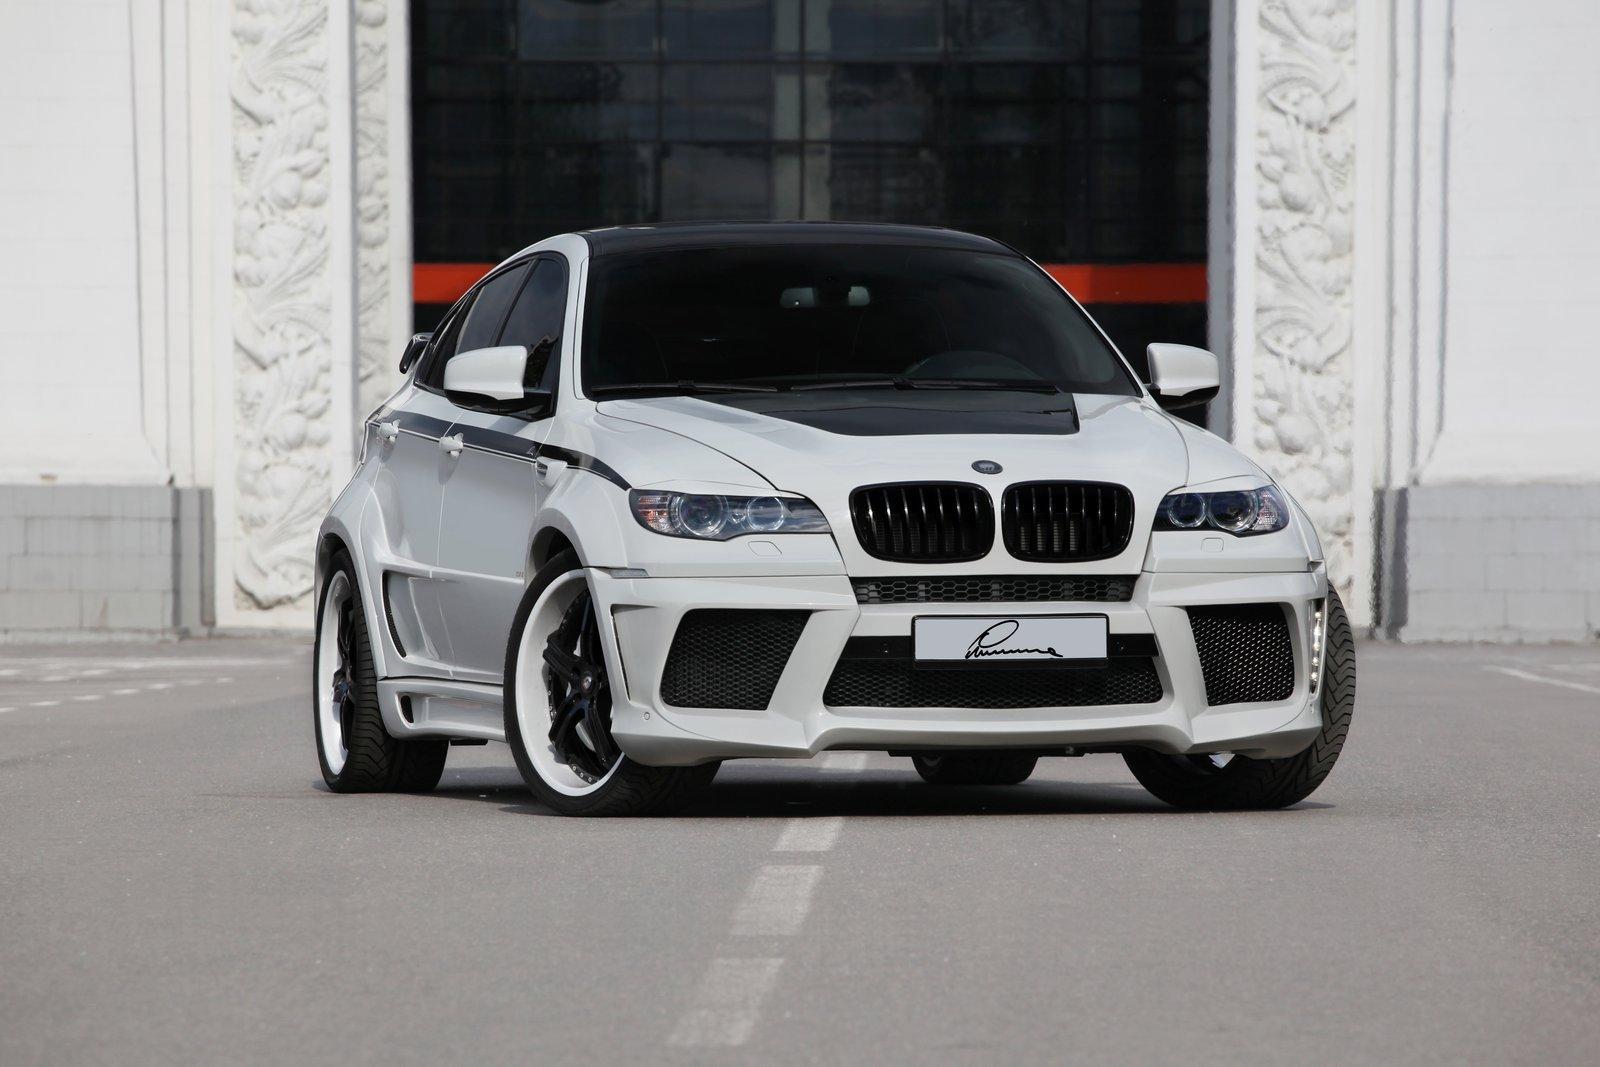 http://2.bp.blogspot.com/-pLsXkQdyjcA/Tt9EICgQF7I/AAAAAAAABaE/lYDuGiuV3Y8/s1600/Lumma-Design-BMW-X6-CLR-X-650-4.jpg